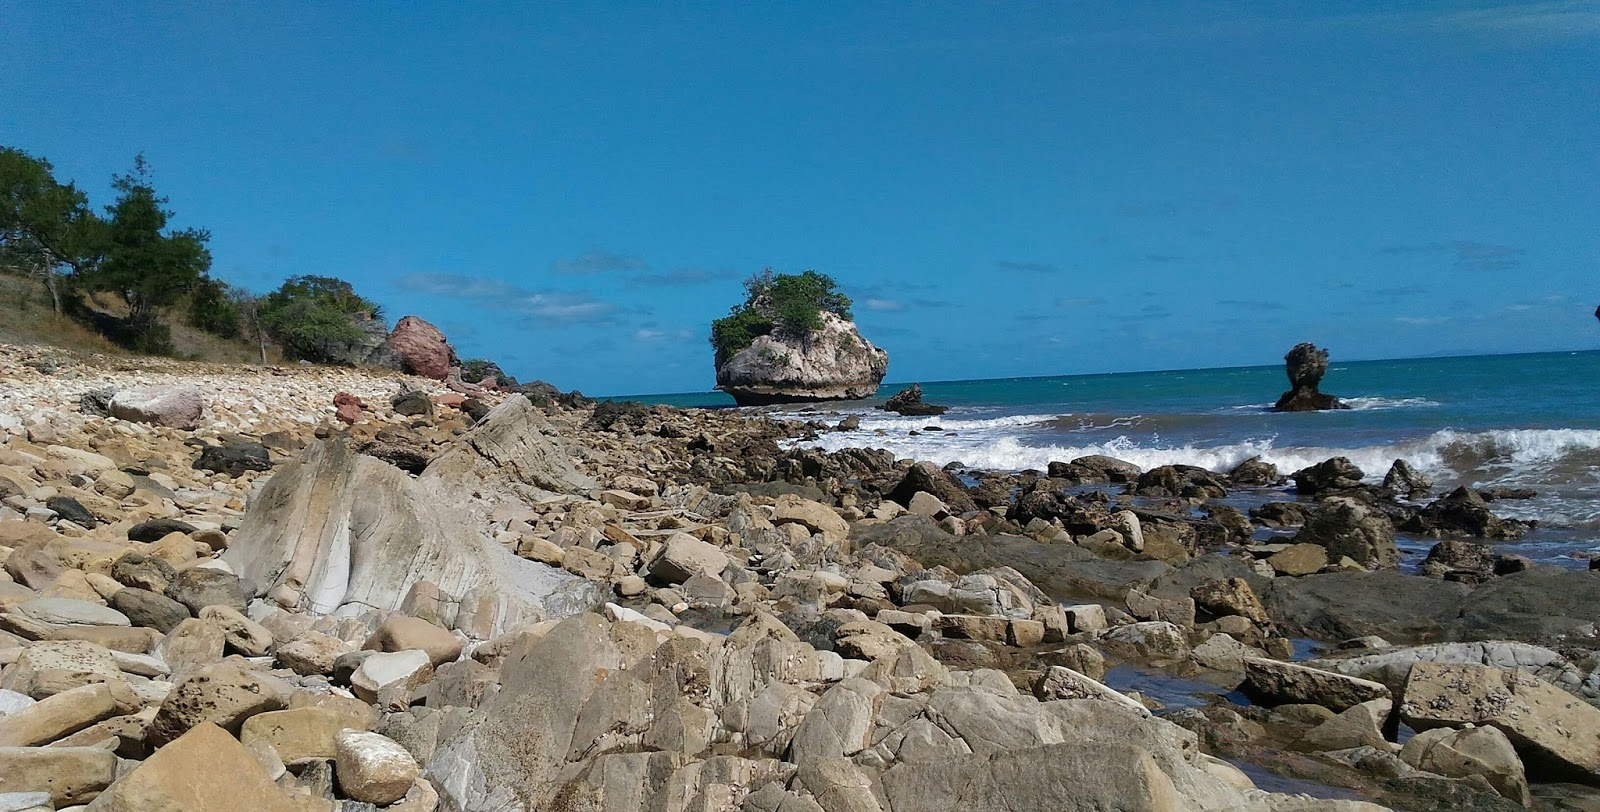 Arianto Ntt Pantai Batu Burung Kabupaten Kupang Tempat Parkir Tedis